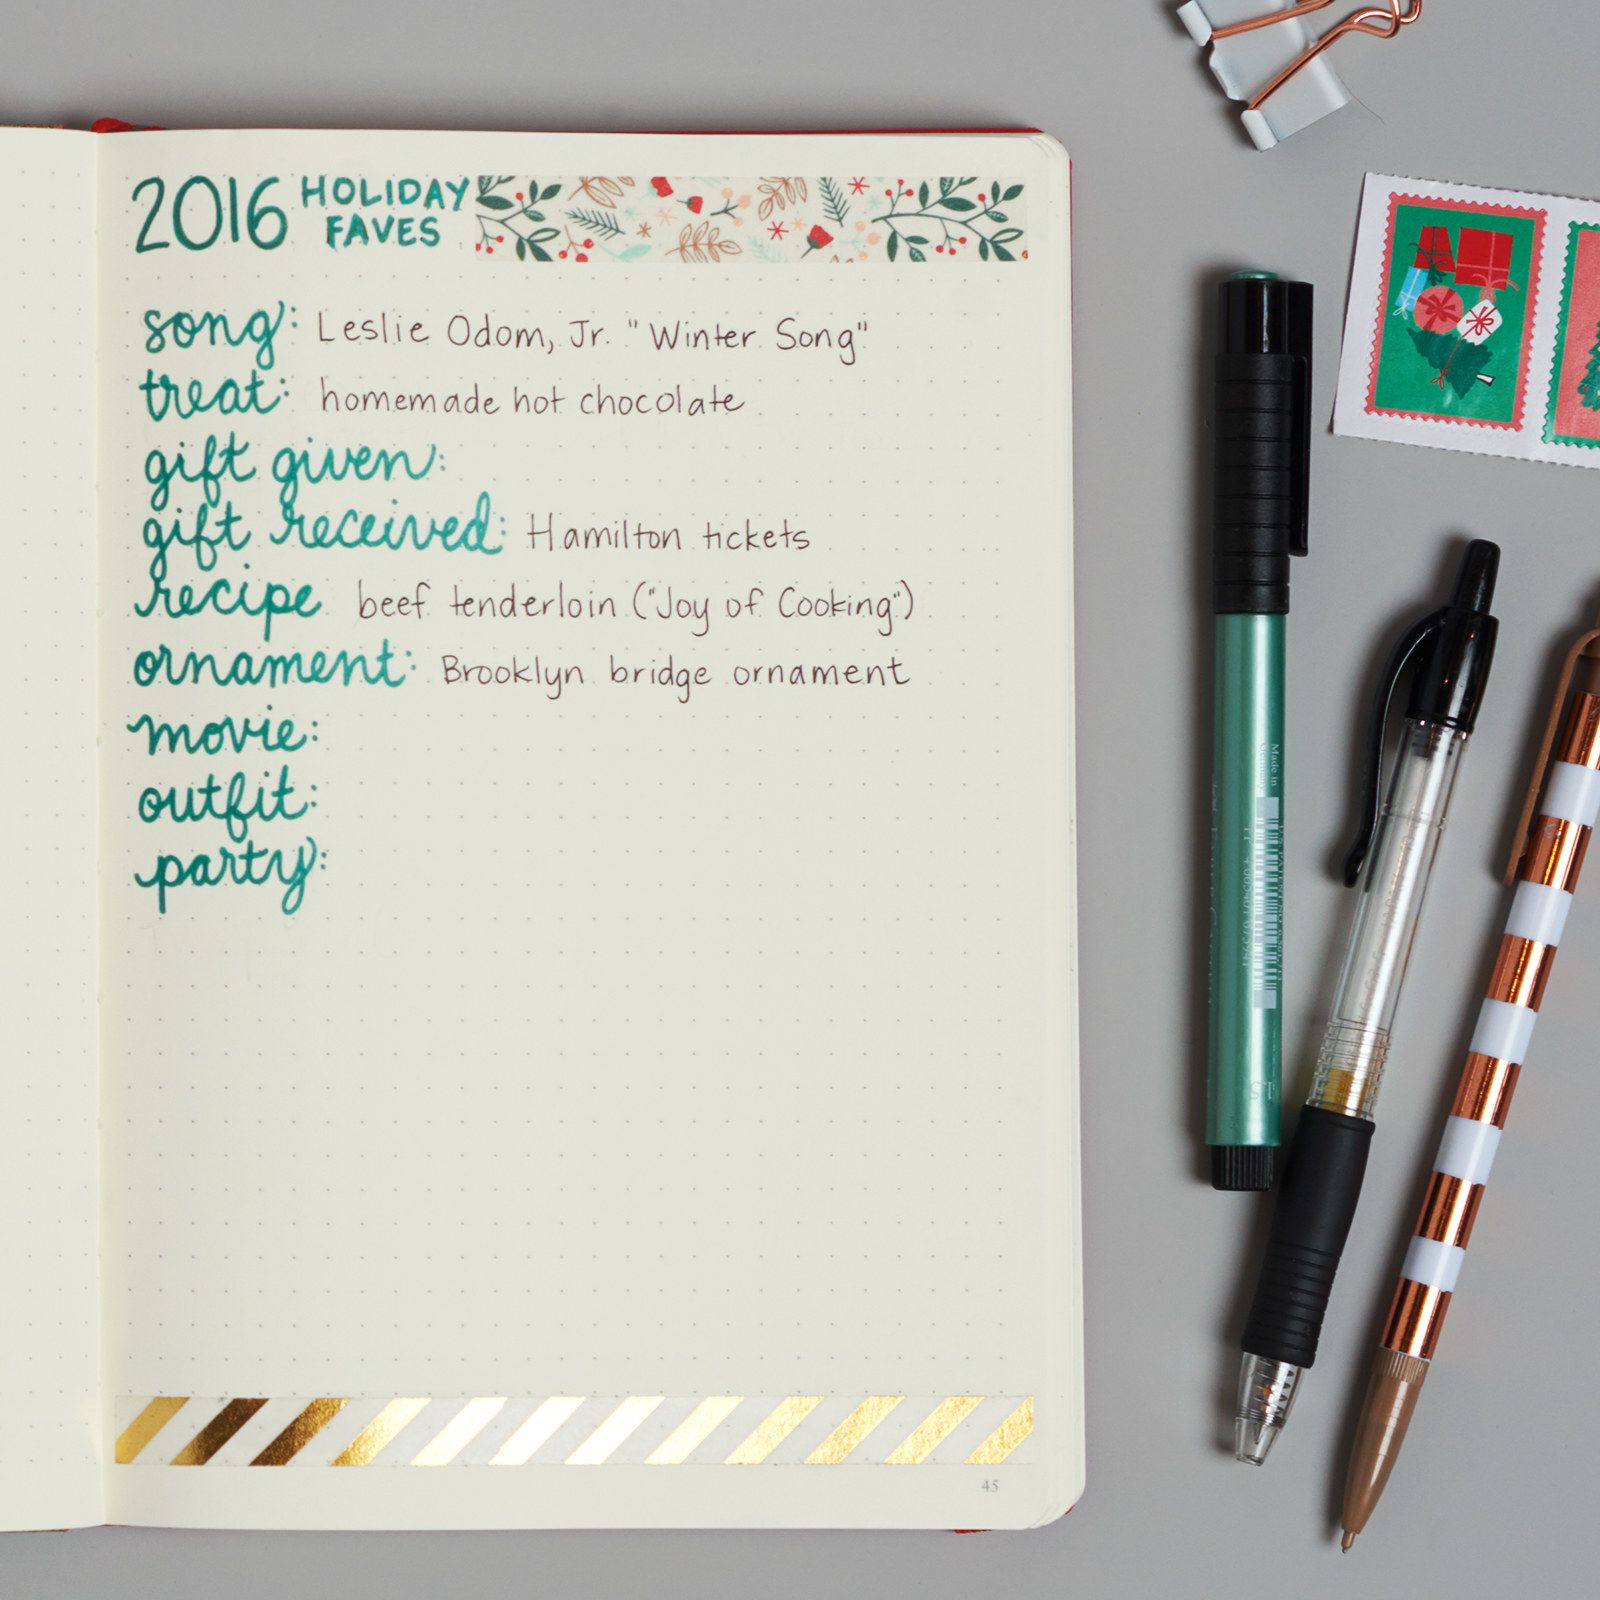 21 Very Merry Christmas Bullet Journal Ideas | Pinterest | Bullet ...